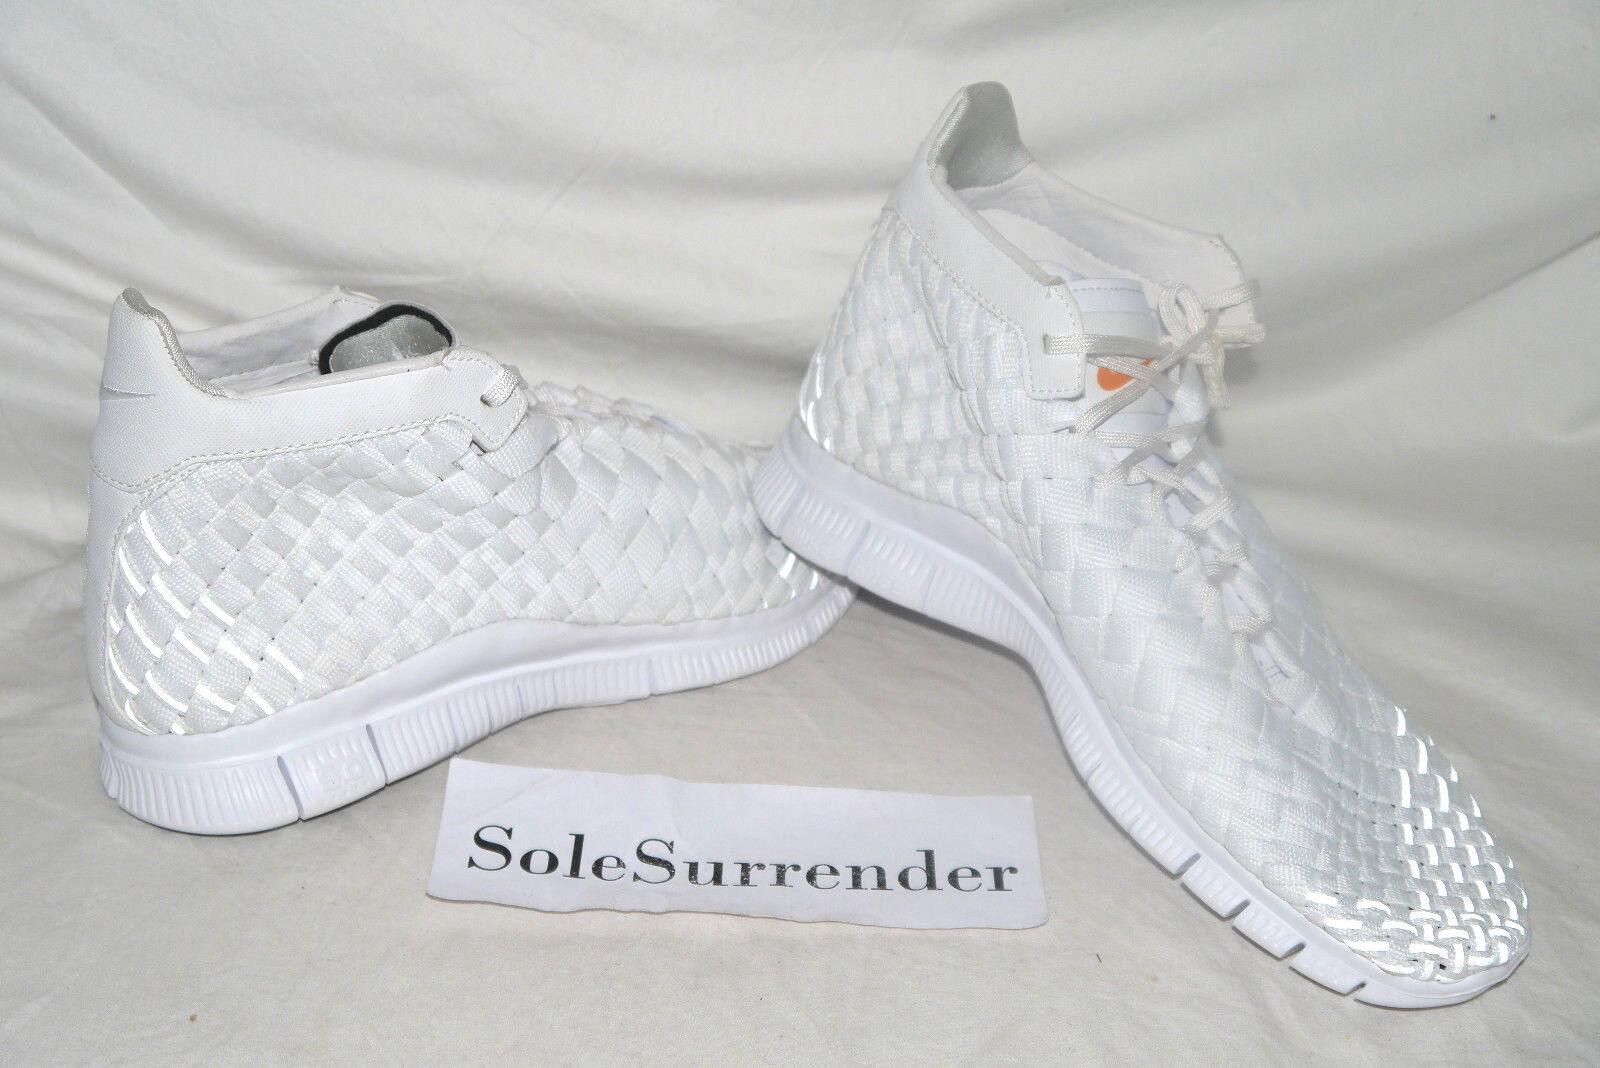 Nike Free Inneva Woven Mid SP - CHOOSE SIZE - 800907-110 Triple Whiteout Tech QS